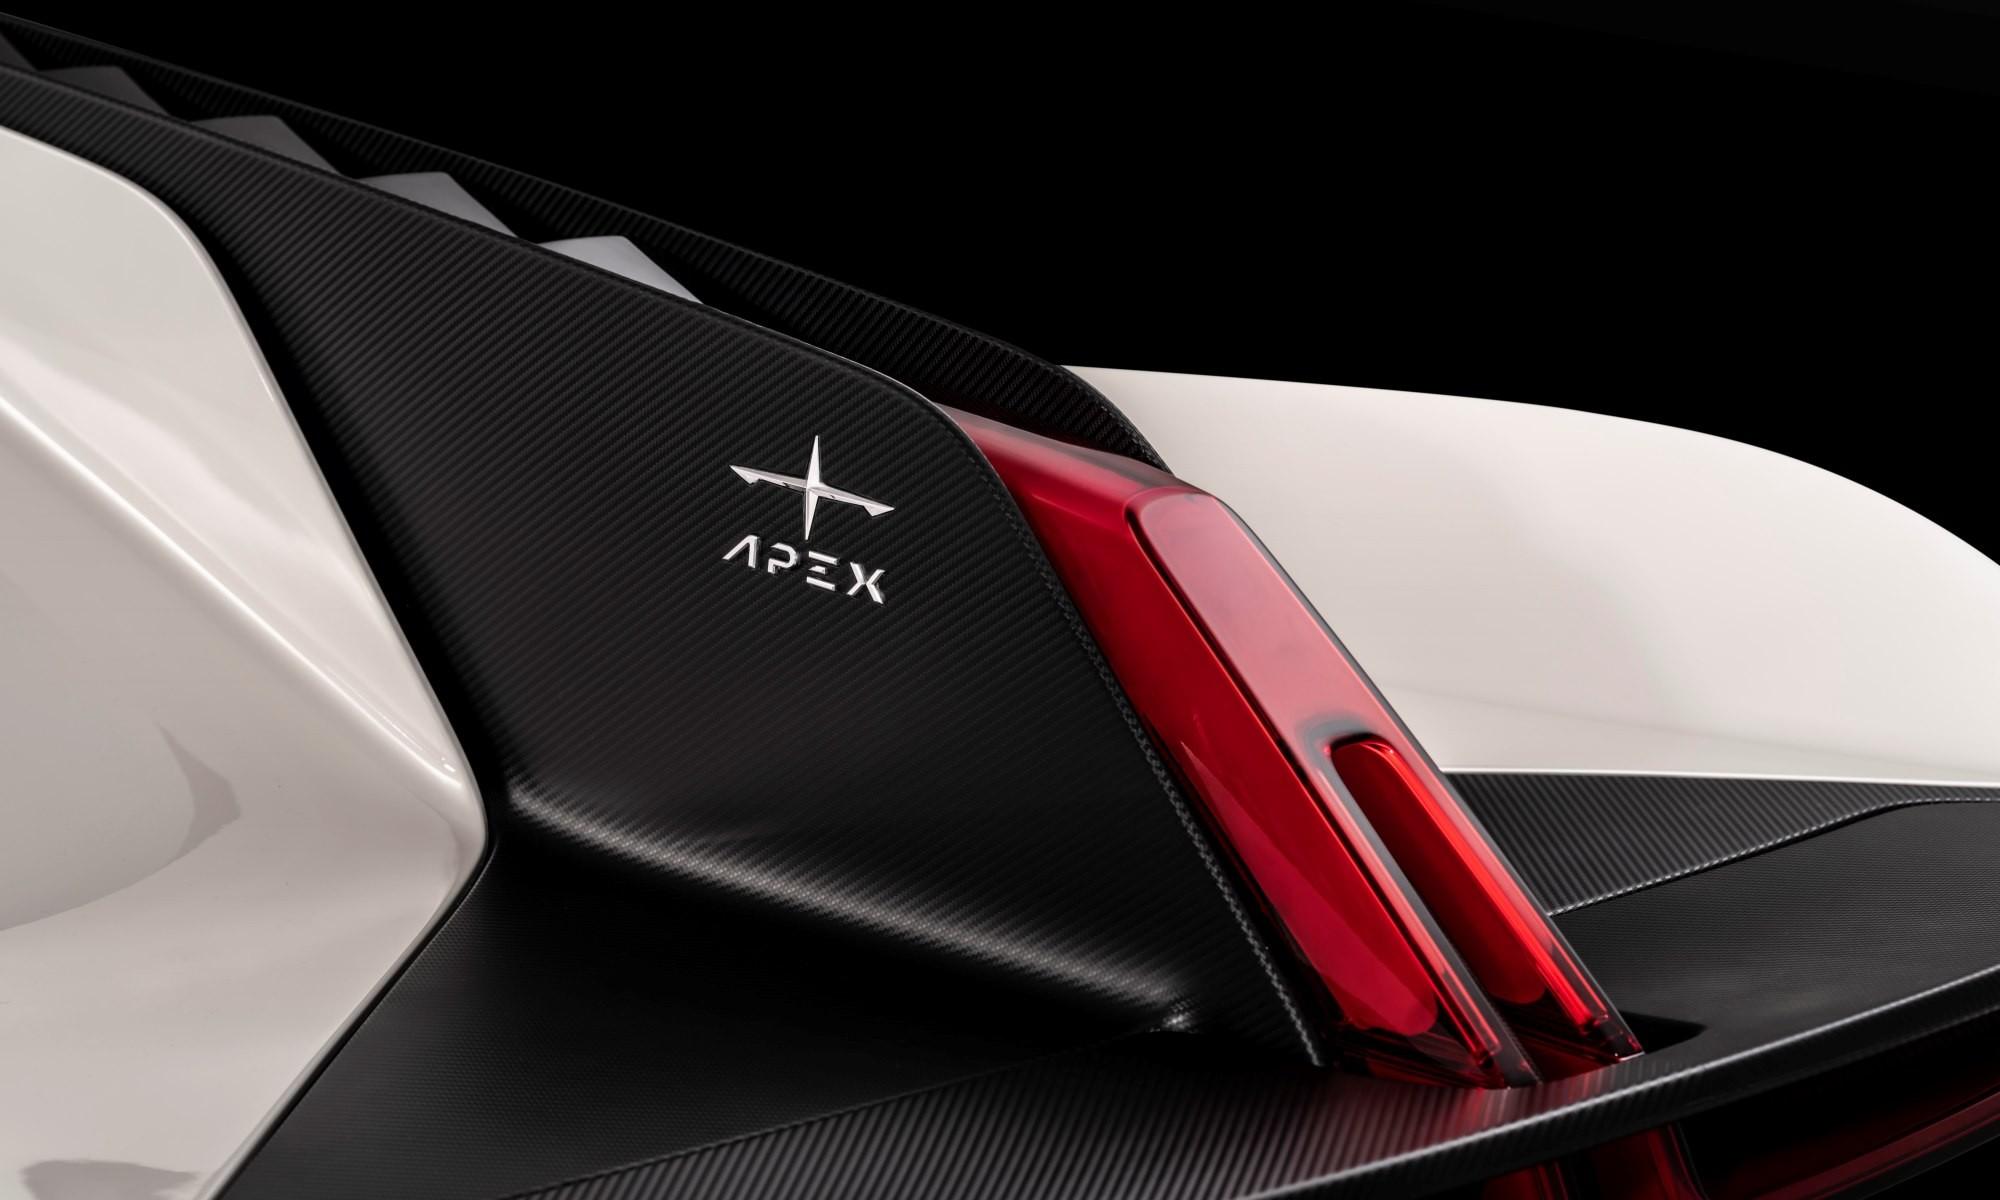 Apex AP-0 fin